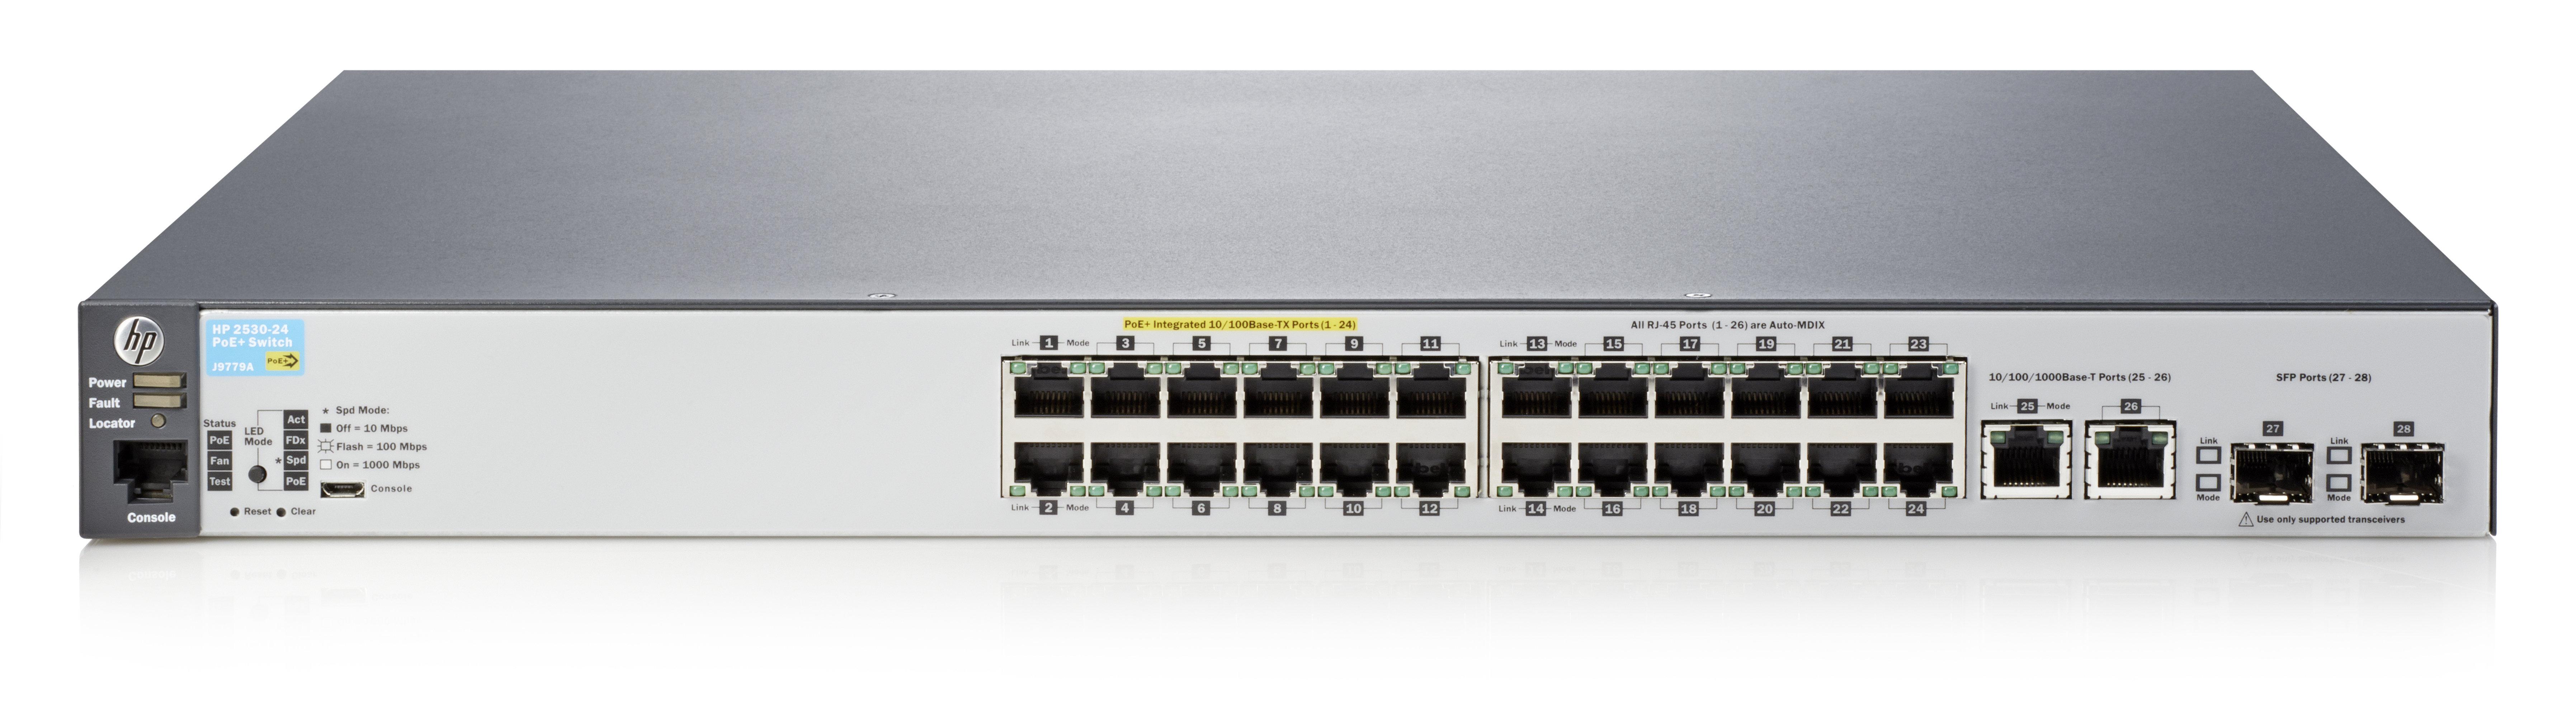 Aruba 2530-24-PoE+ - switch - 24 ports - Managed - rack-mountable